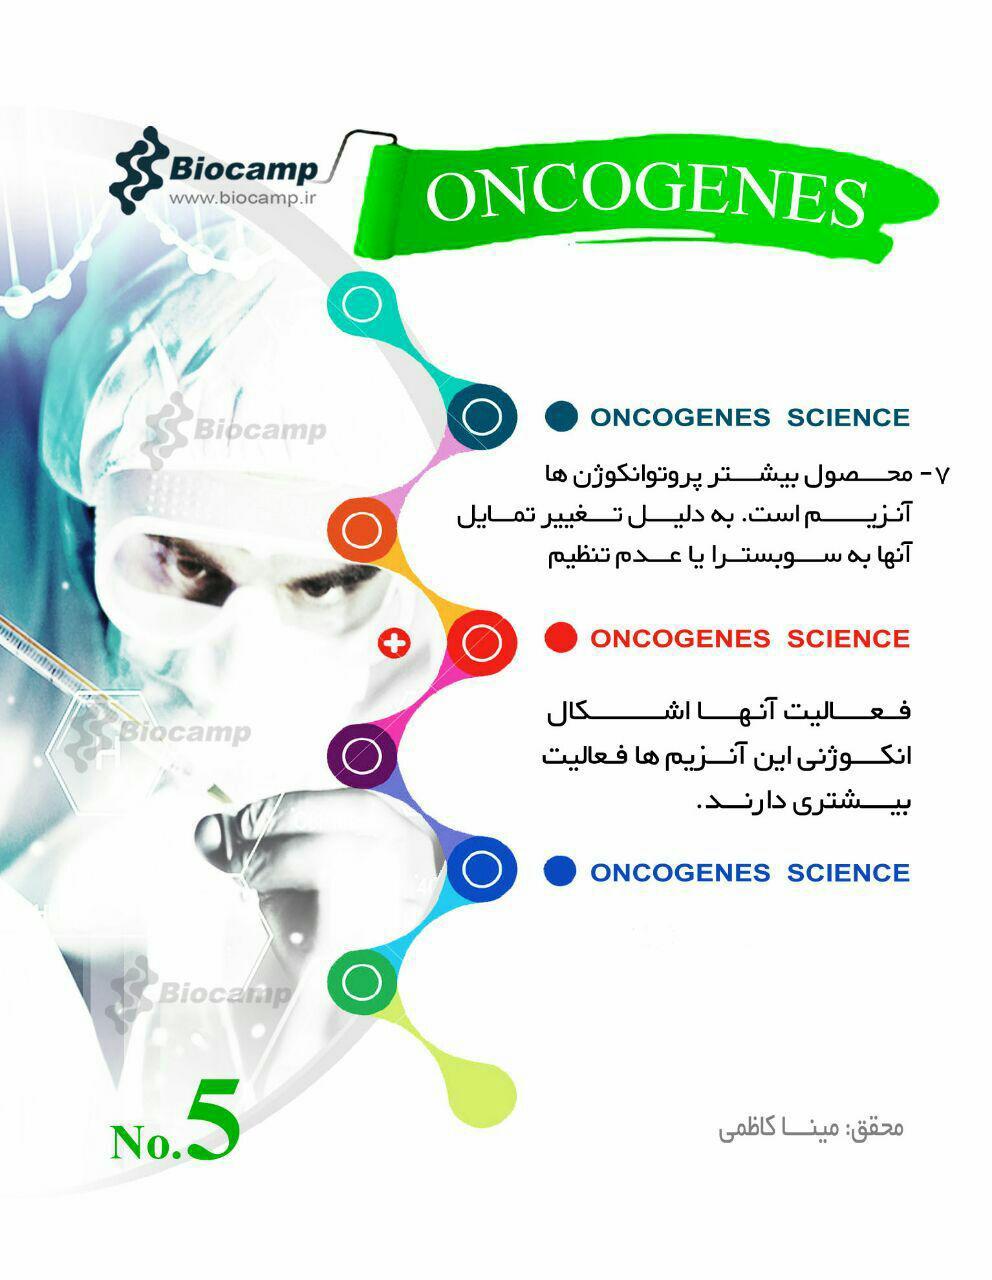 انکوژن انکوژن چیست؟ اینفوگرافی انکوژن چیست؟ اینفوگرافی photo 2016 09 12 21 16 17